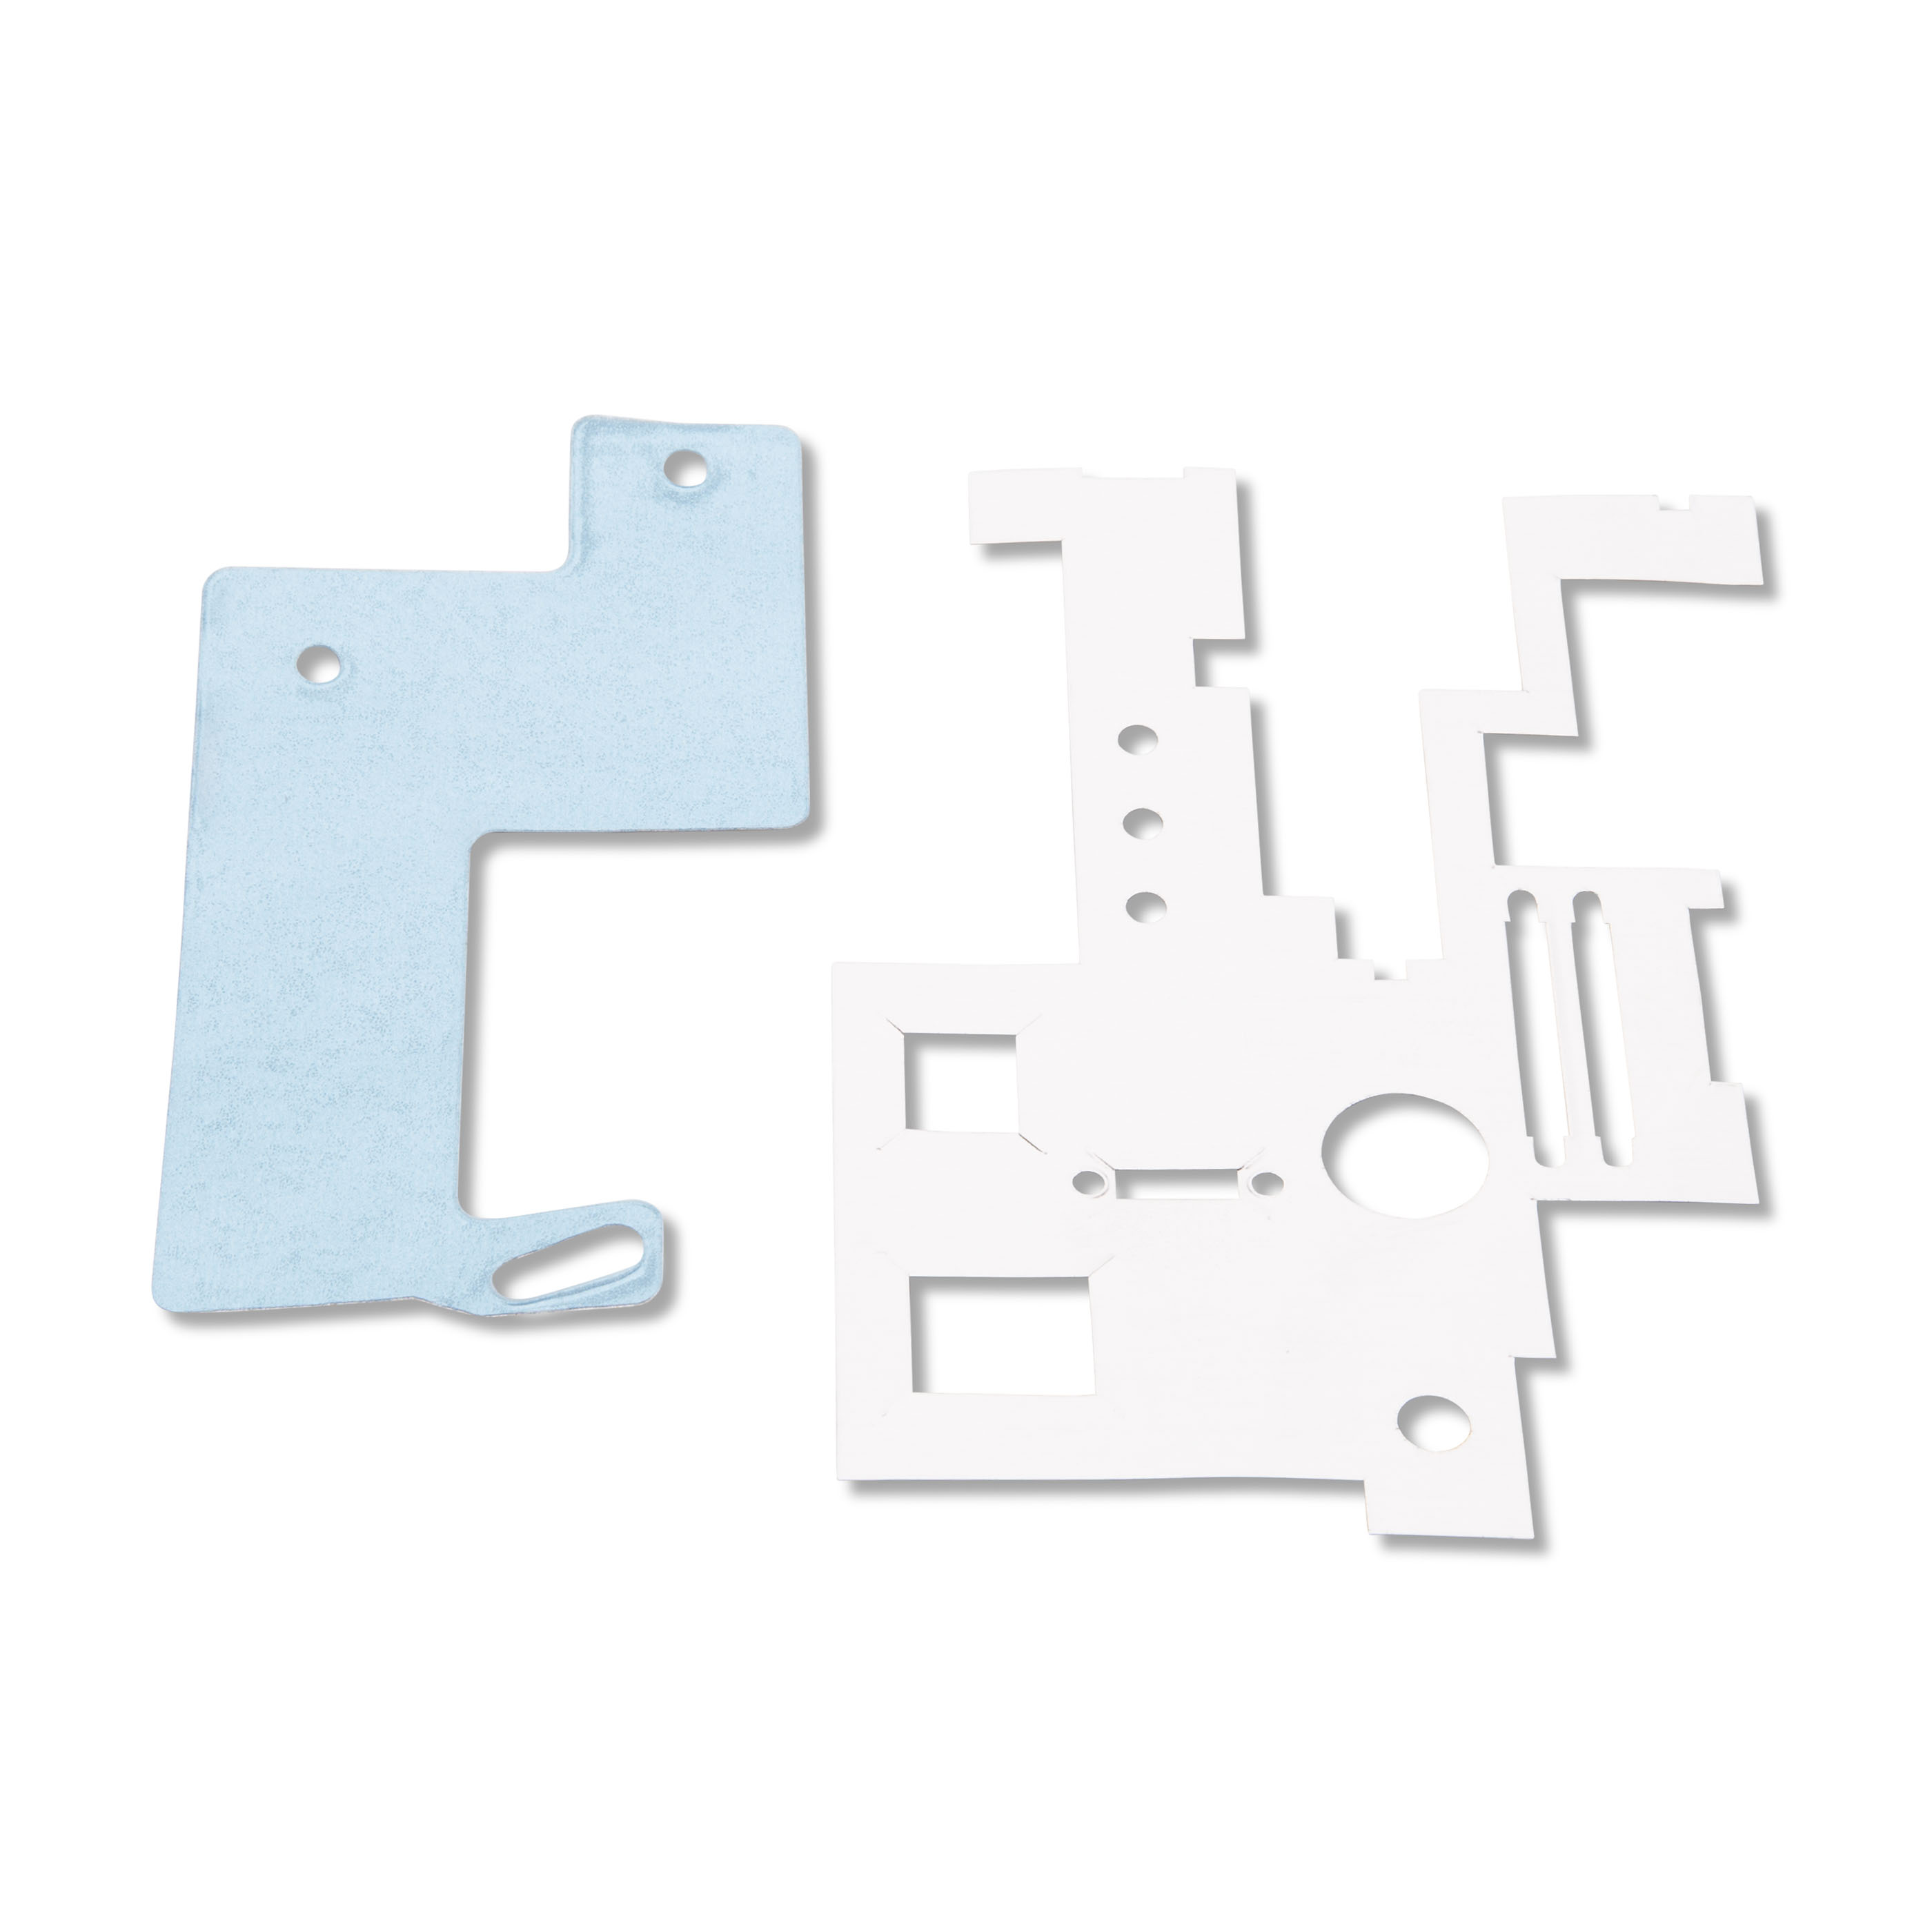 parker-chomerics-emi-shielding-solutions-PARKER_EMI_SHELDING_CHOSTRAPS_L1011-12_1126_V1_FULL